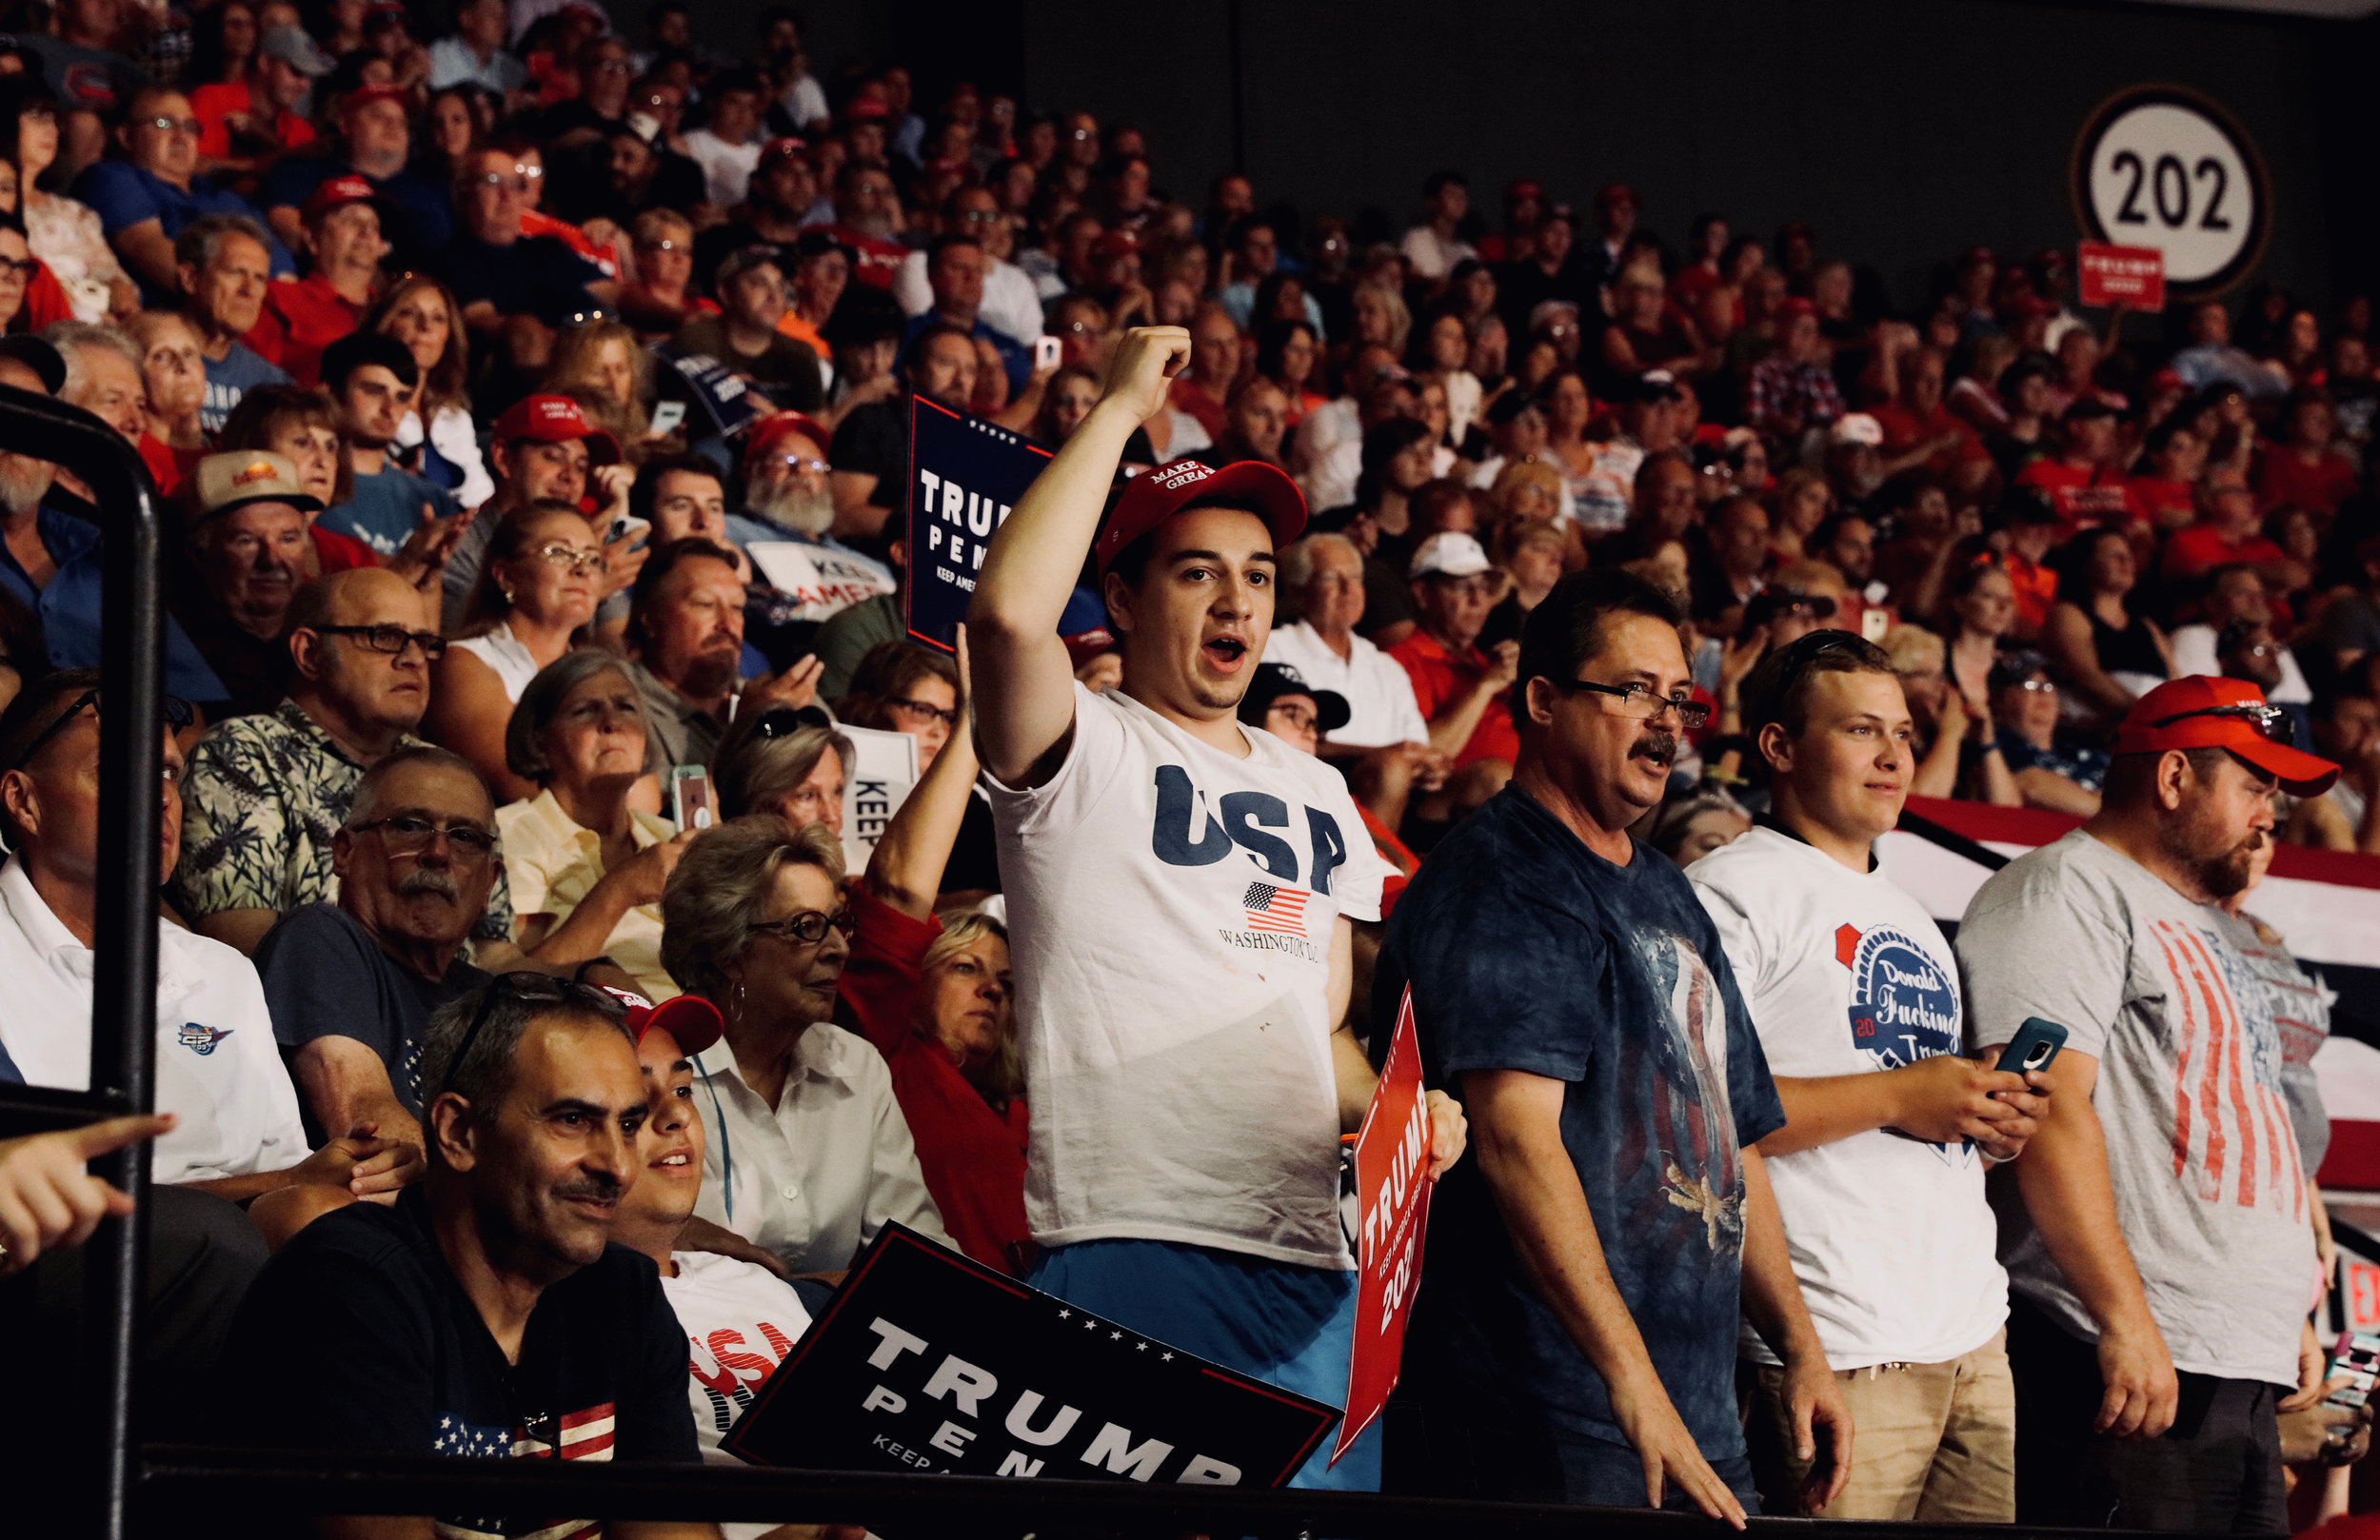 Andy Grant - Trump Rally 8.1.1977.jpg